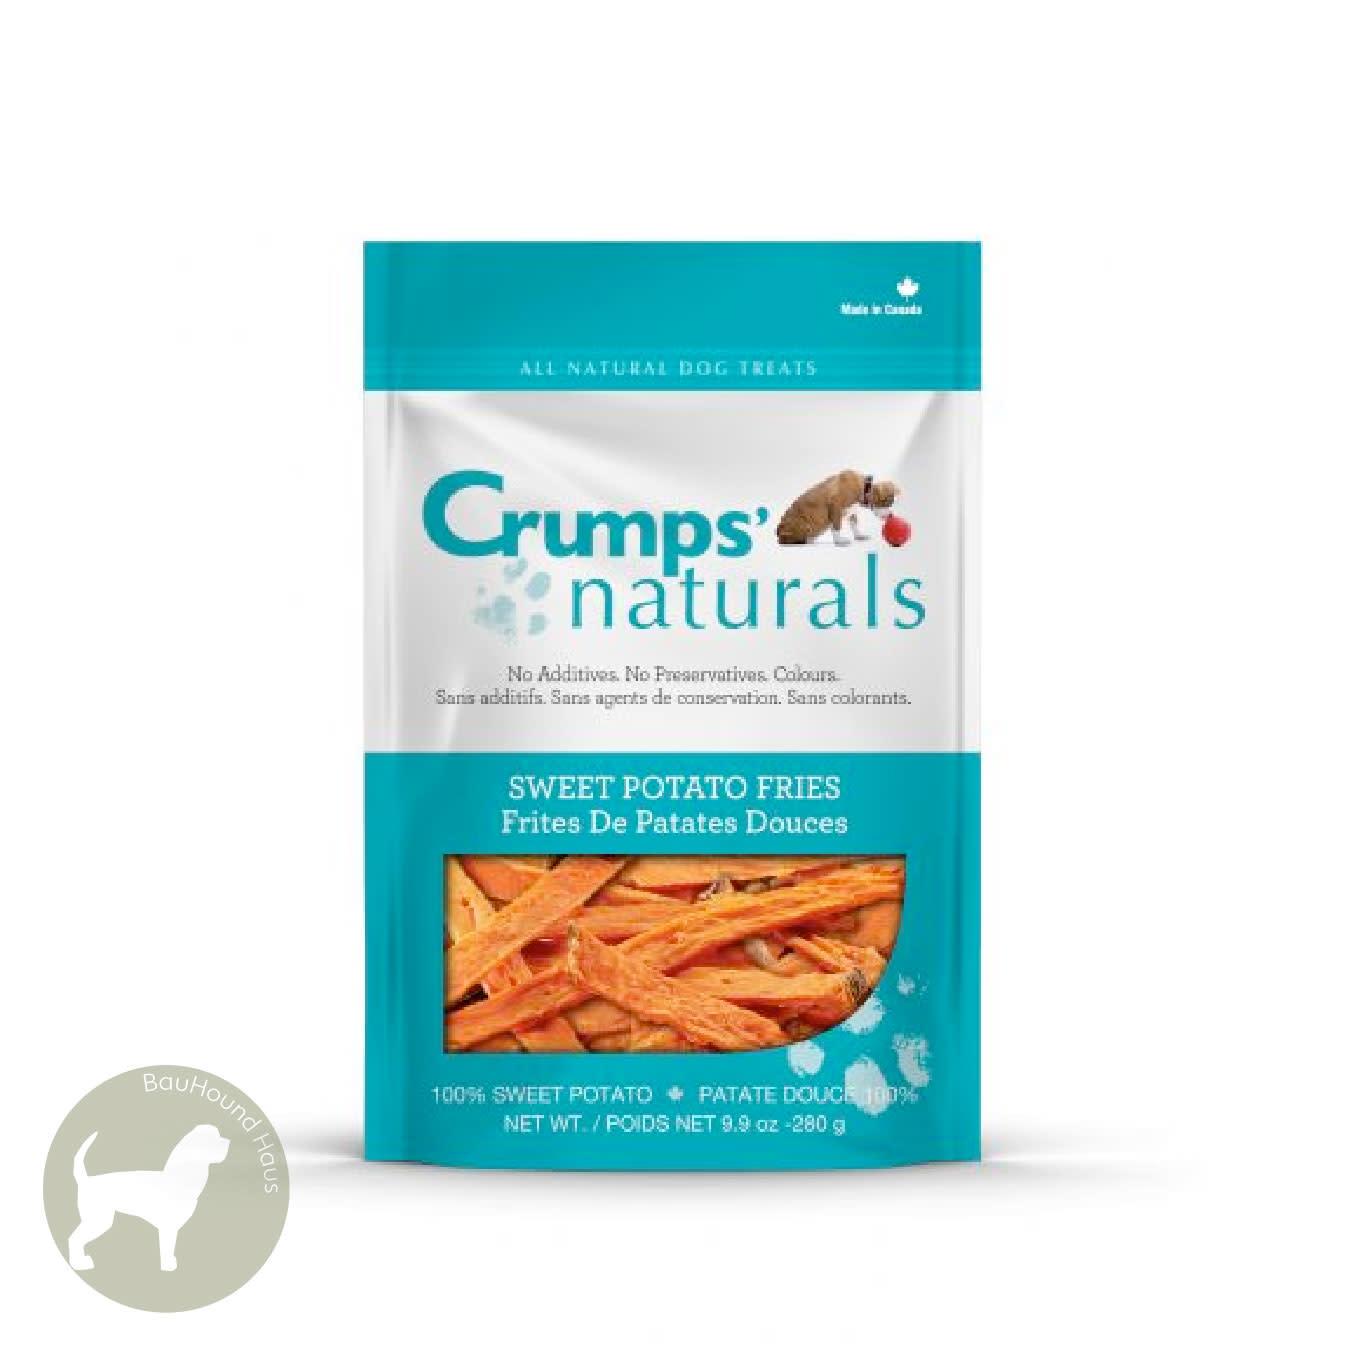 Crumps Crumps Natural Sweet Potato Fries, 135g